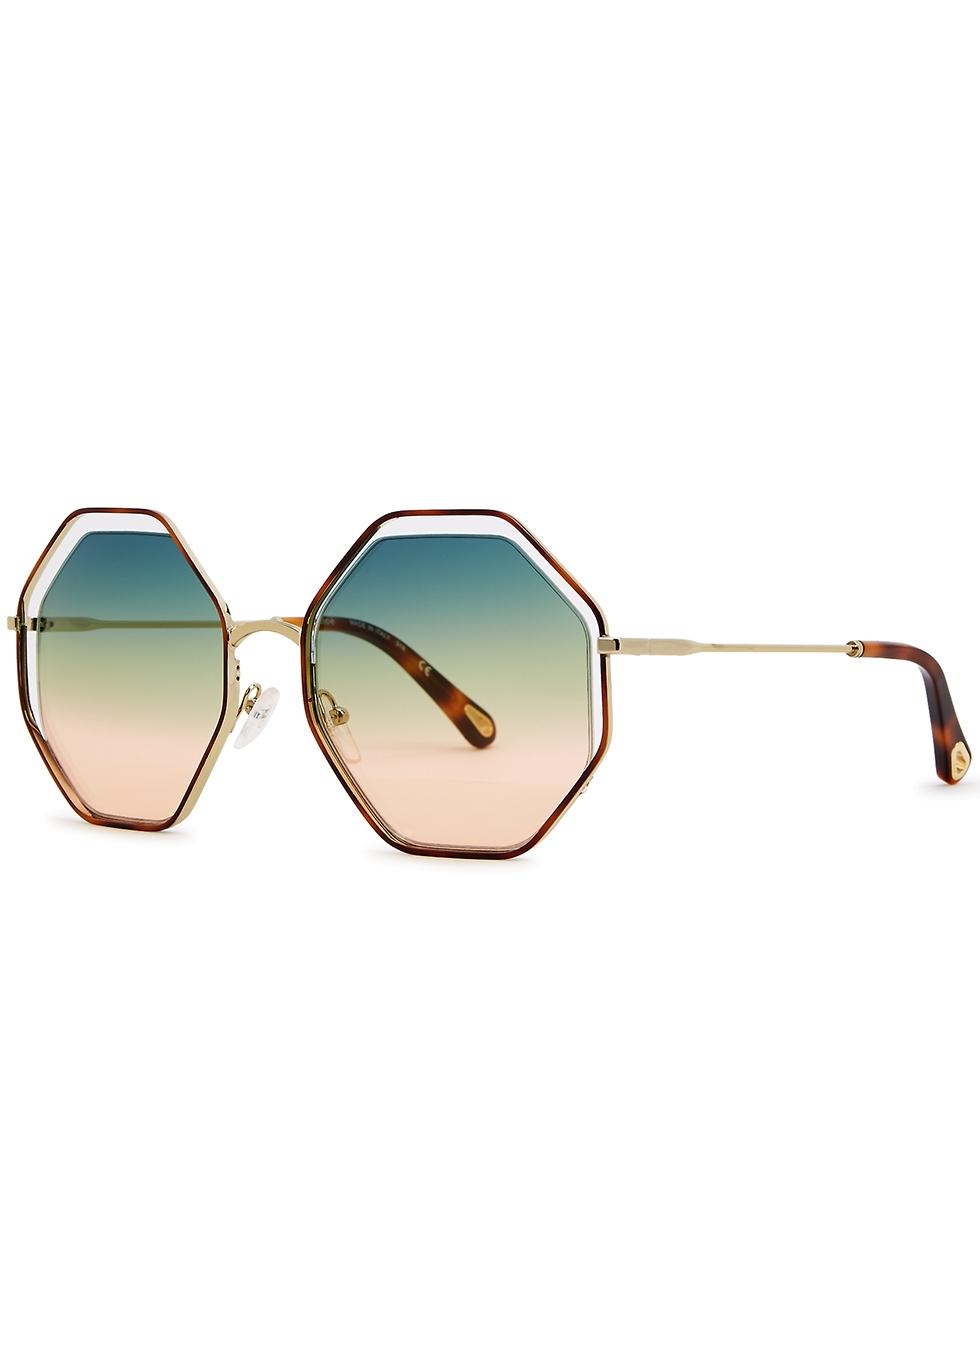 Poppy octagon-frame sunglasses - Chloé